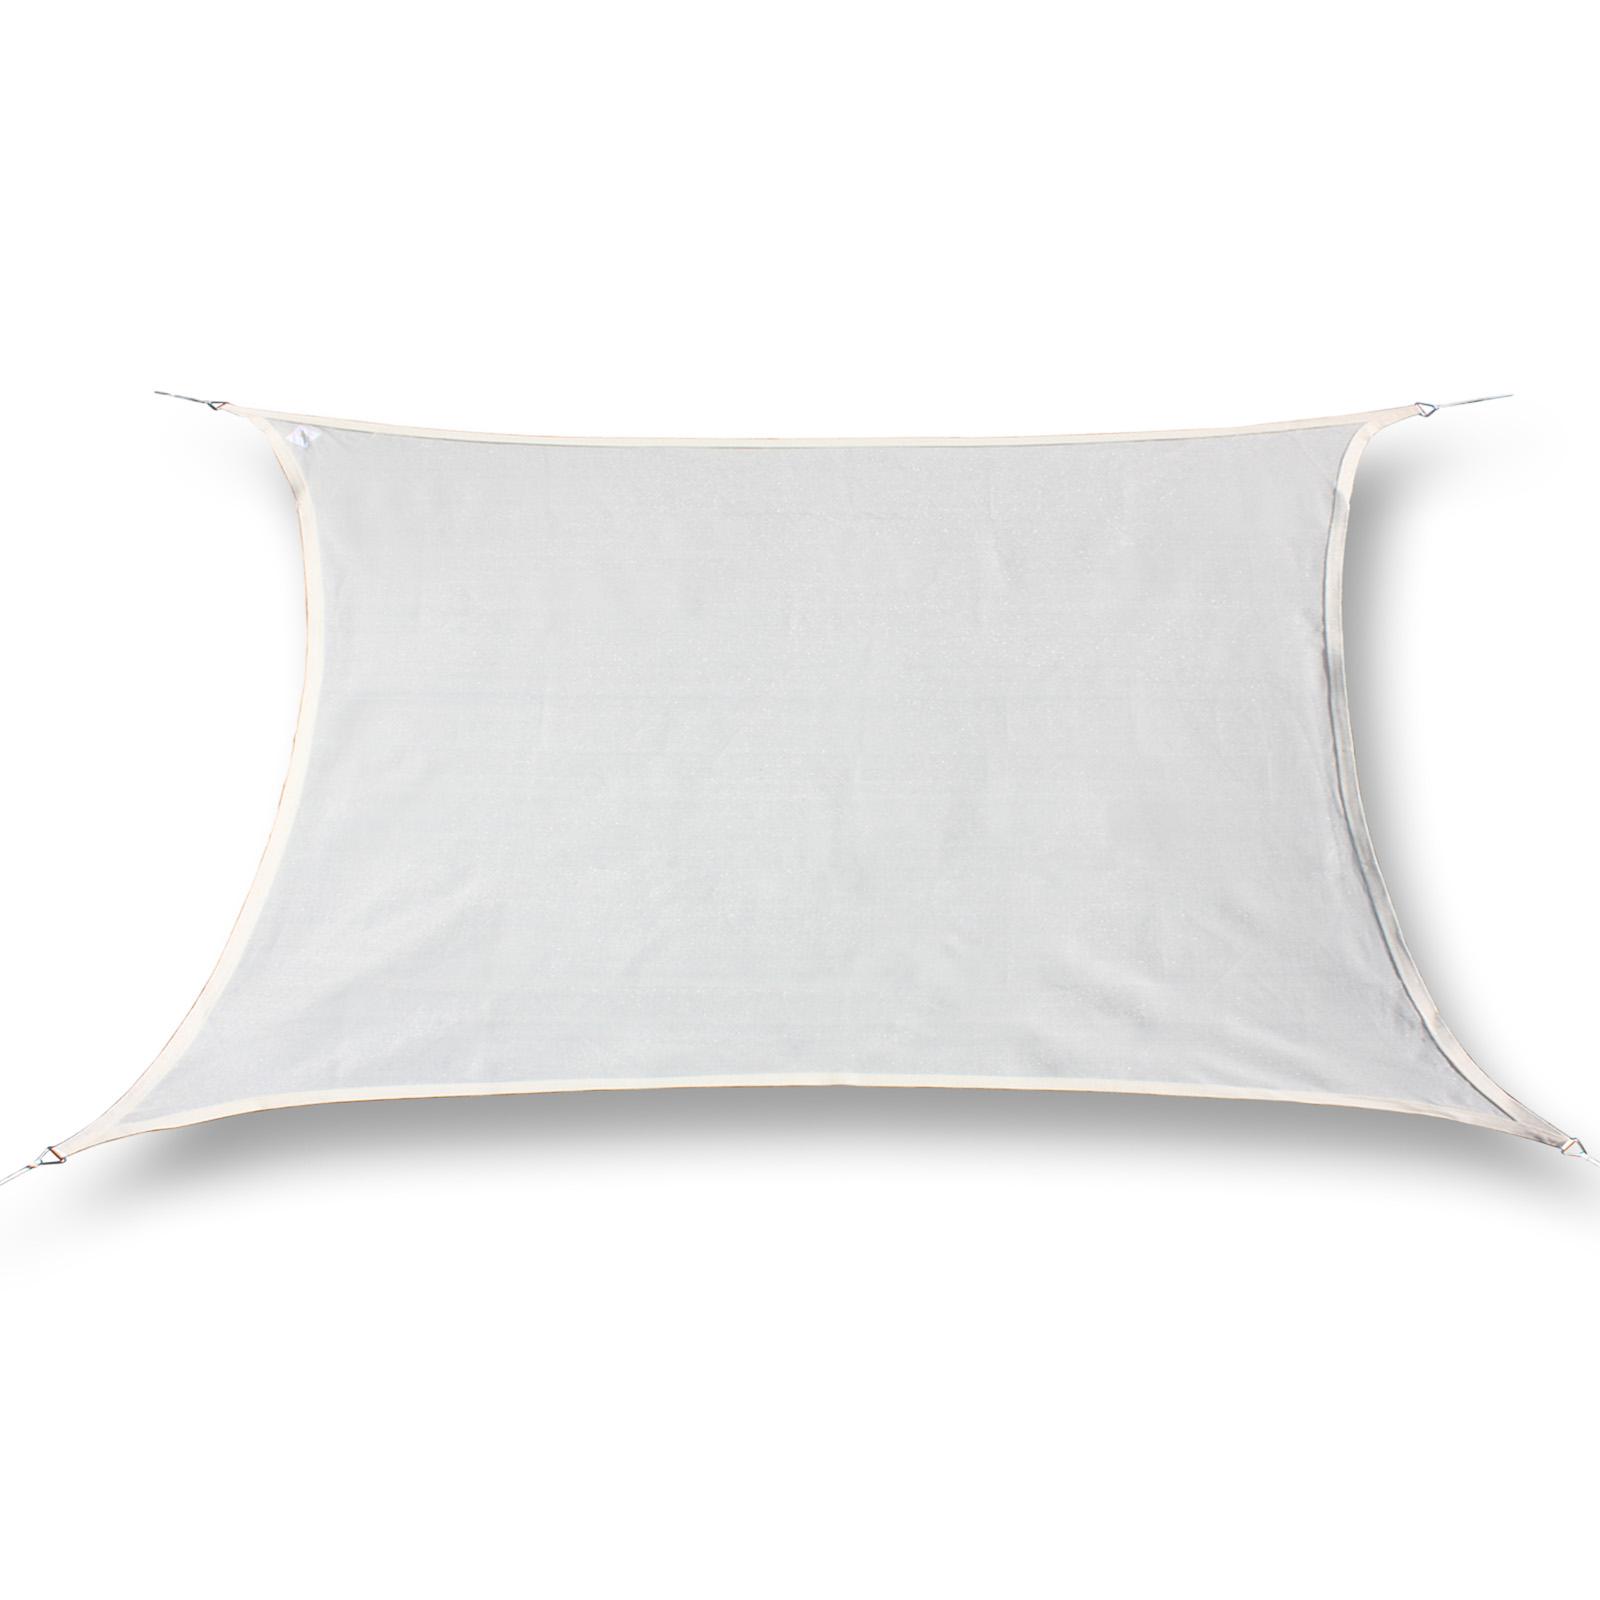 sonnensegel wasserdicht rechteck 3 farben garten sonnensegel rechteckig. Black Bedroom Furniture Sets. Home Design Ideas